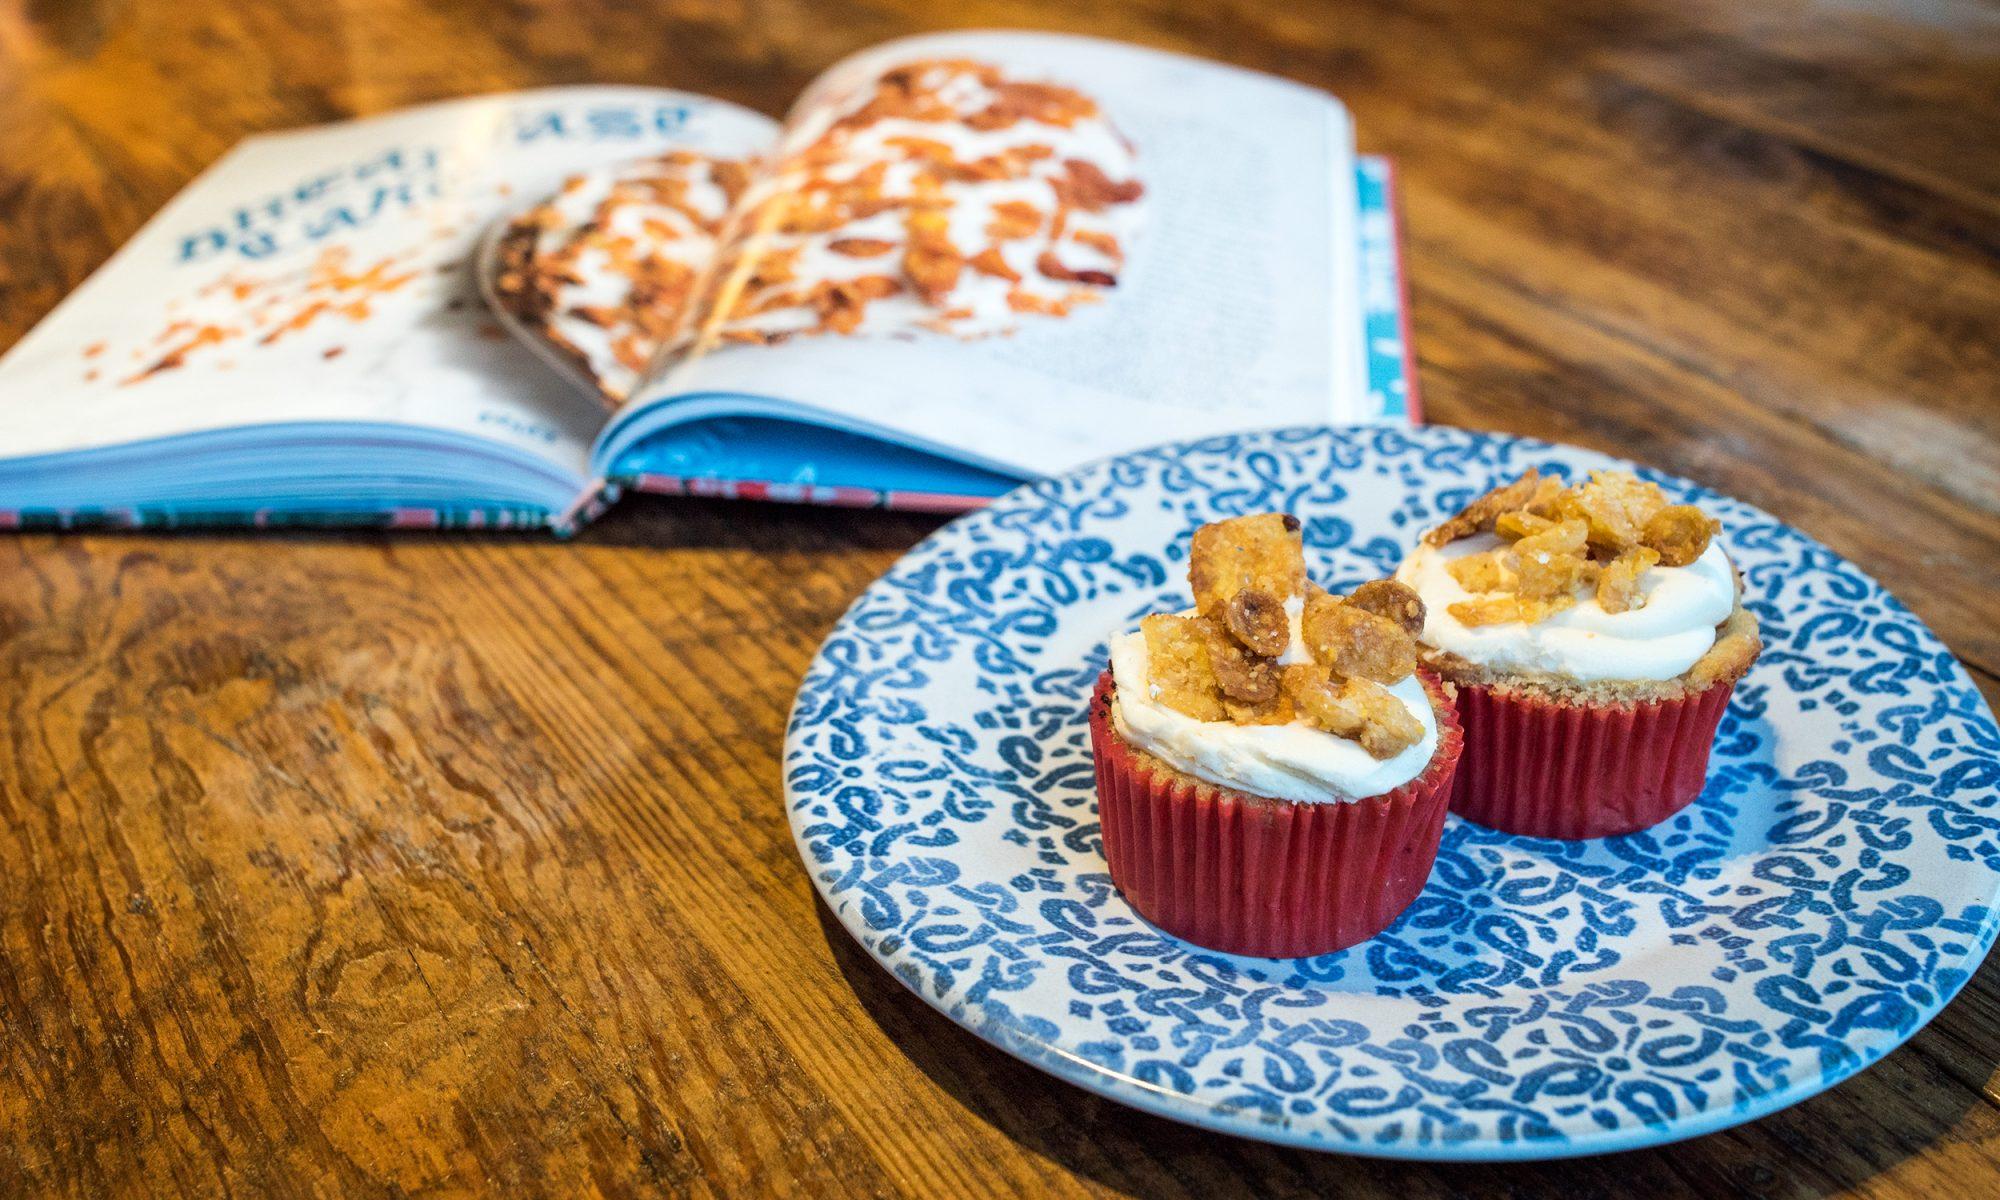 This Vegan Breakfast Cake Tastes Like a Bowl of Cornflakes